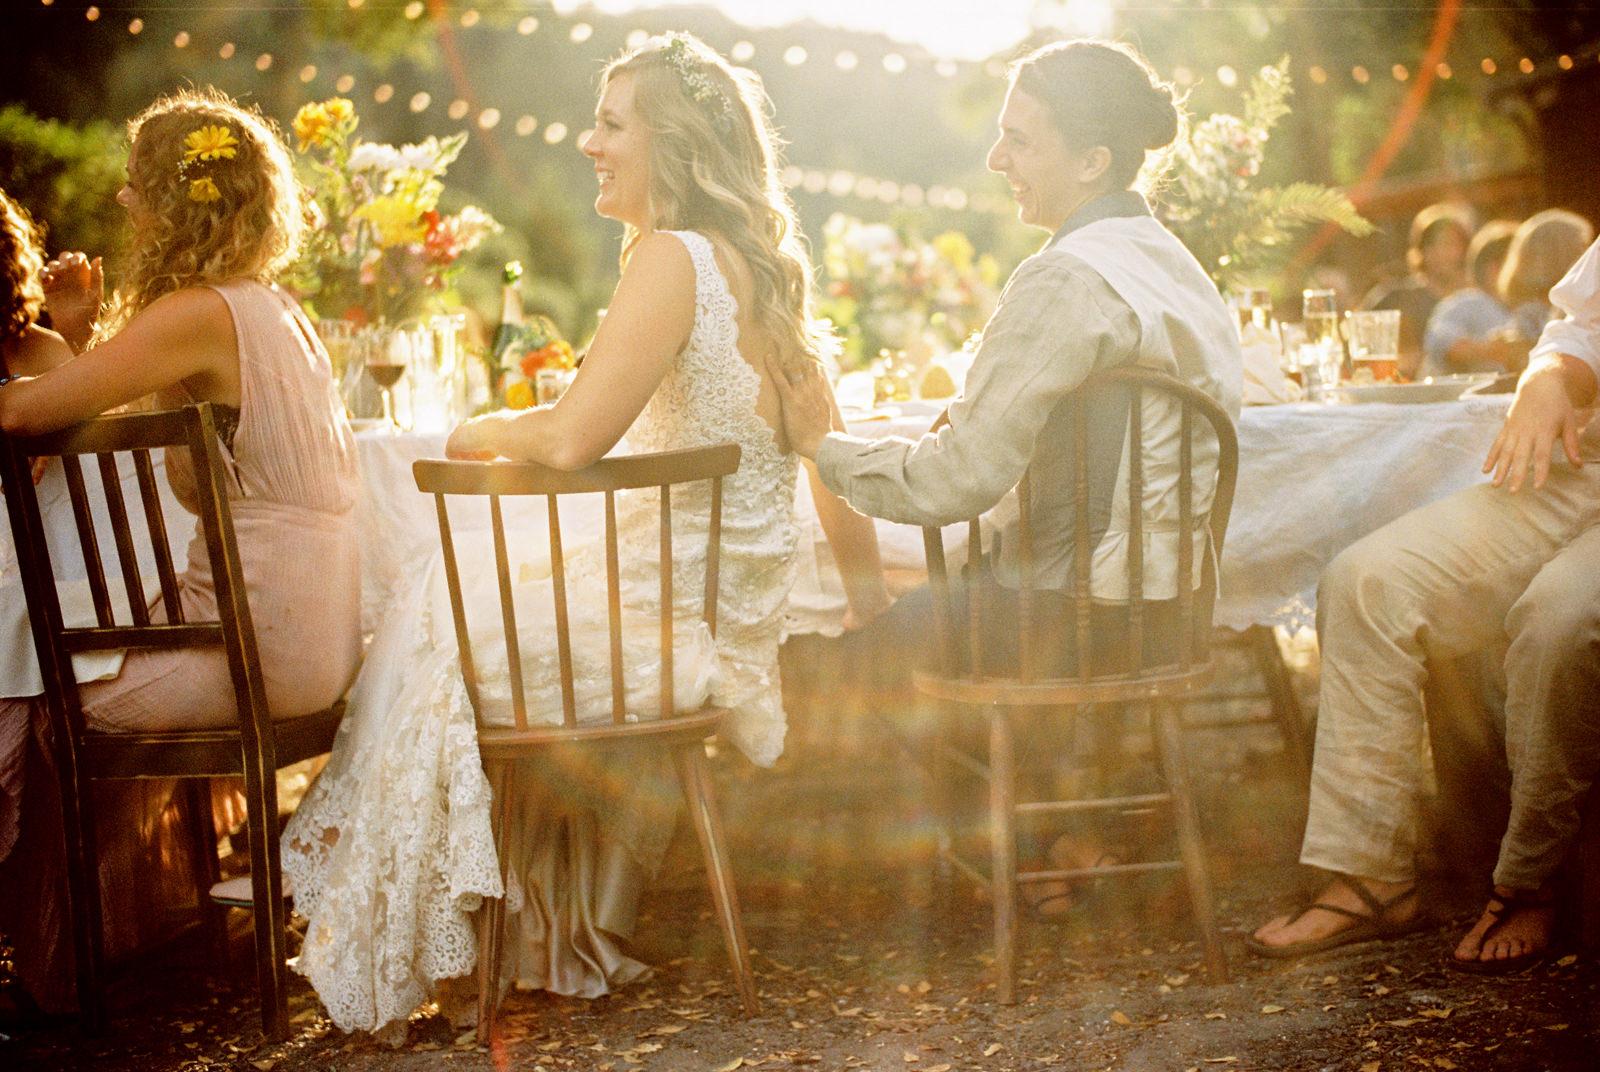 rivers-bend-retreat-wedding-076 RIVER'S BEND RETREAT WEDDING